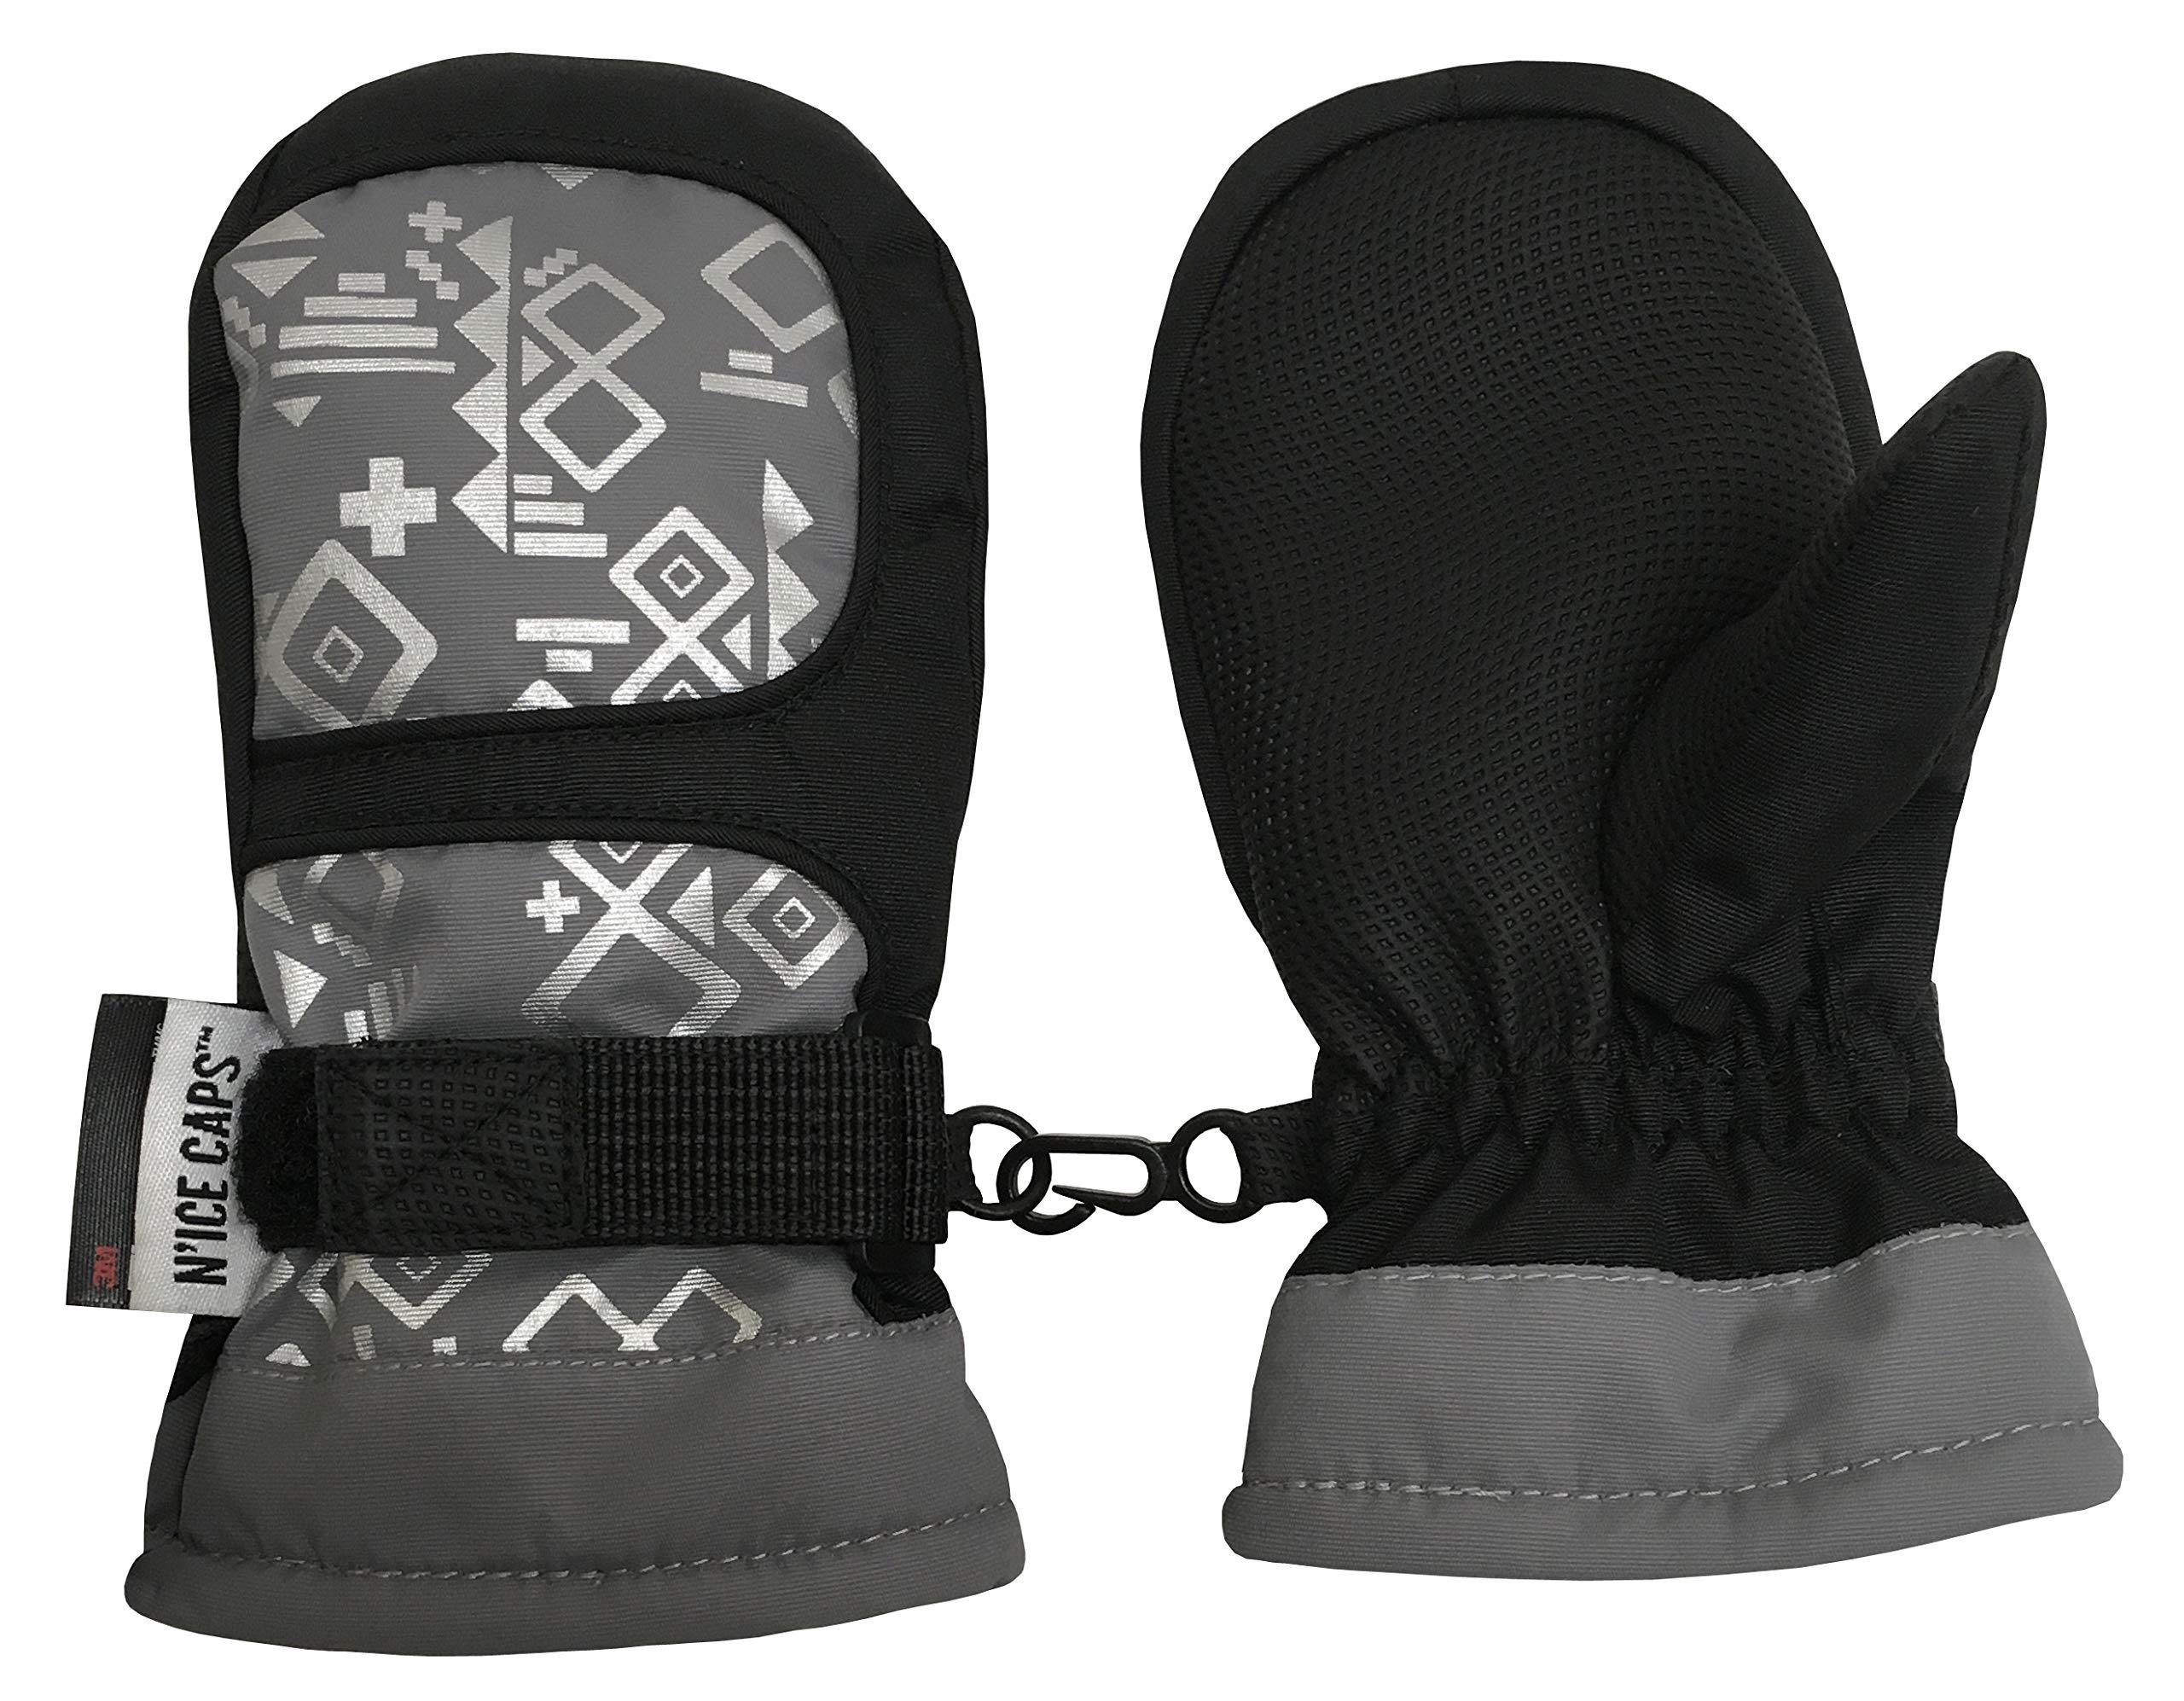 N'Ice Caps Kids Thinsulate Waterproof Geometric Print Winter Snow Mittens (Black/Grey/Silver, 4-5yrs)